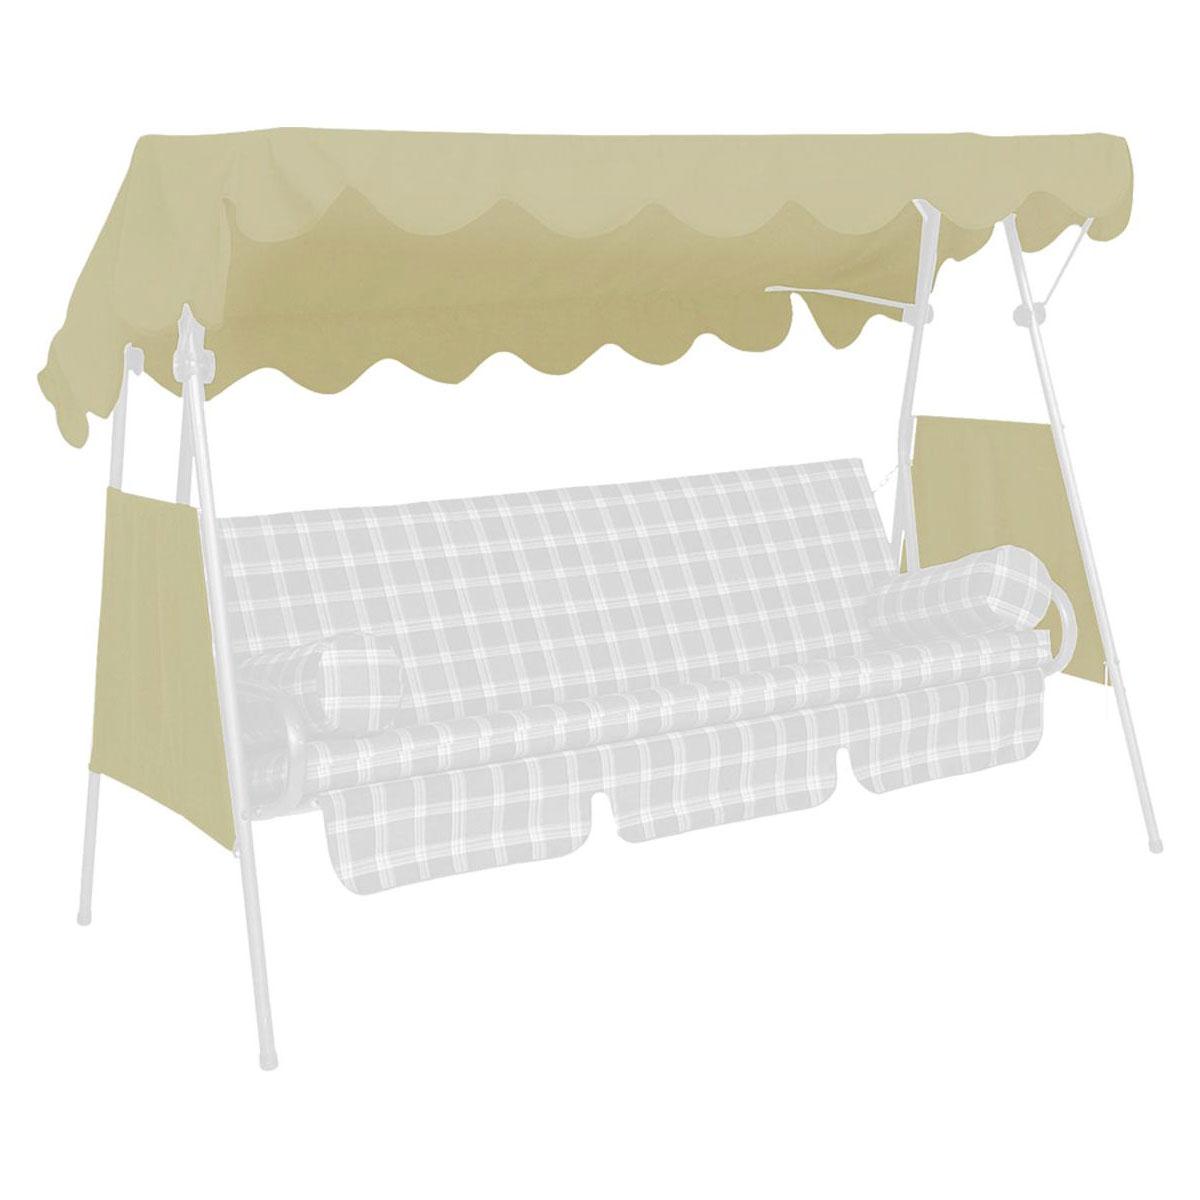 Hollywoodschaukeln - Sonnendach, 200x120 cm, PE beige Beige  - Onlineshop Hellweg